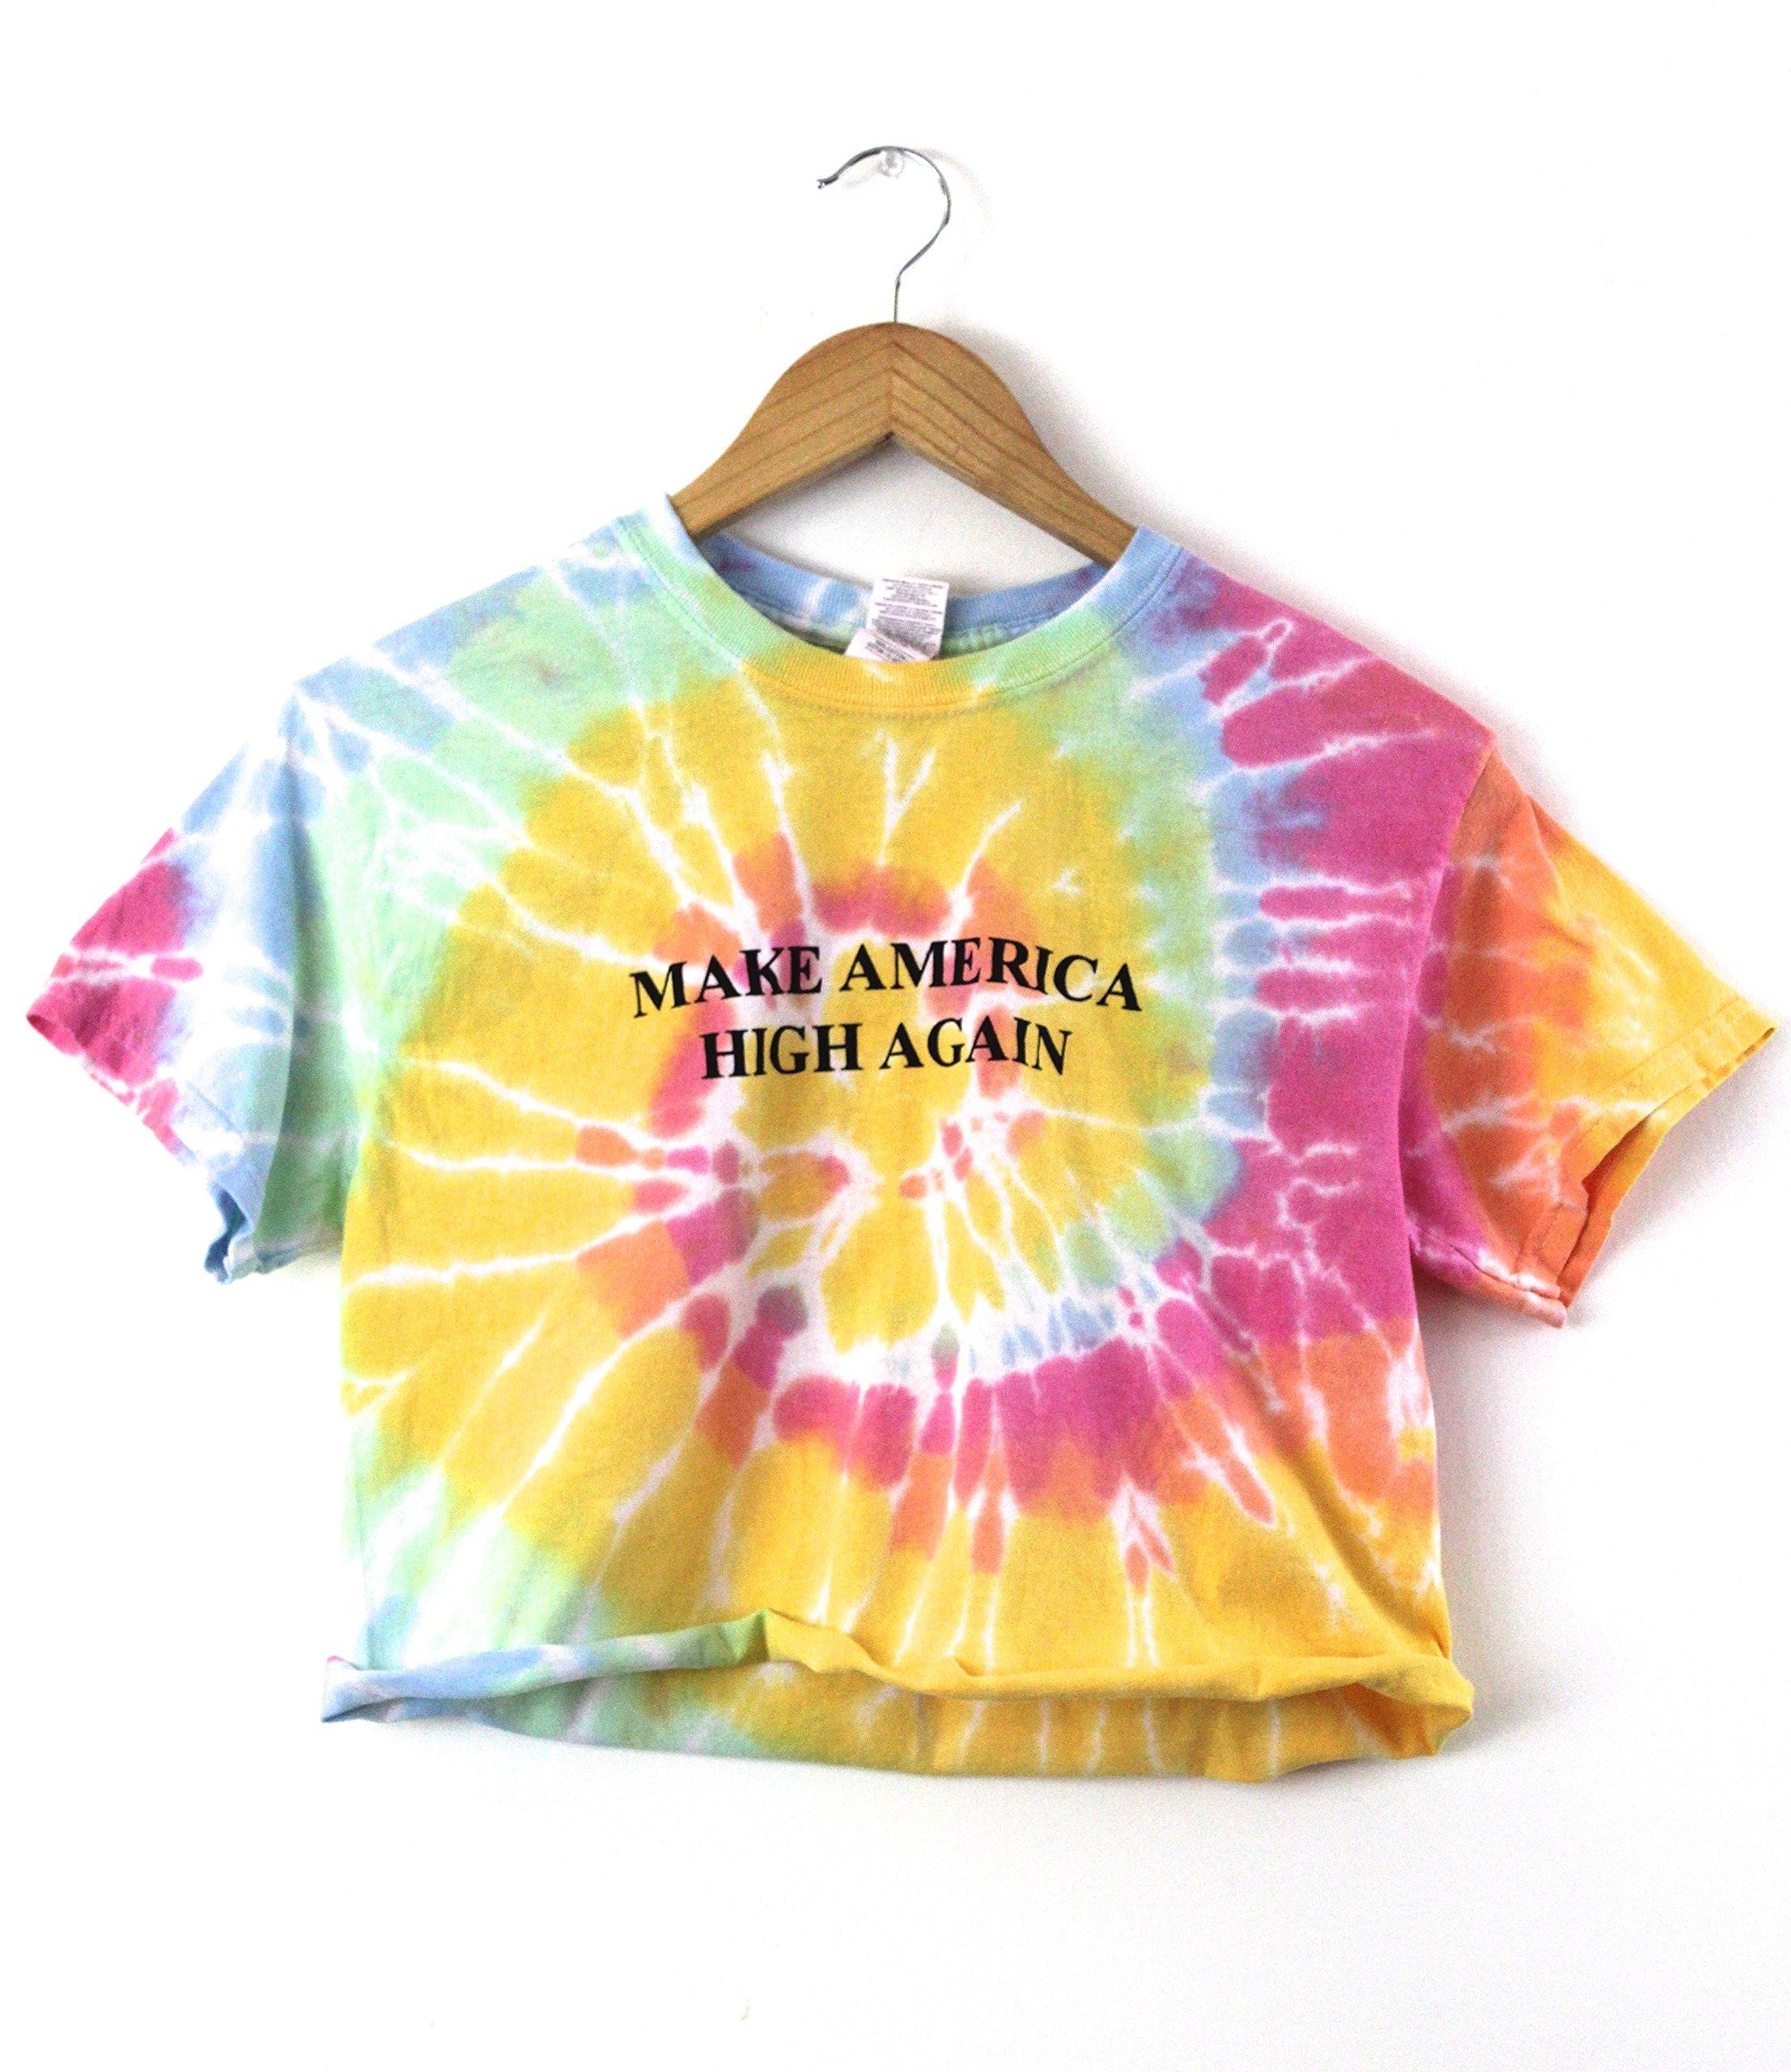 Make America High Again Pastel Rainbow Tie-Dye Graphic Crop Top